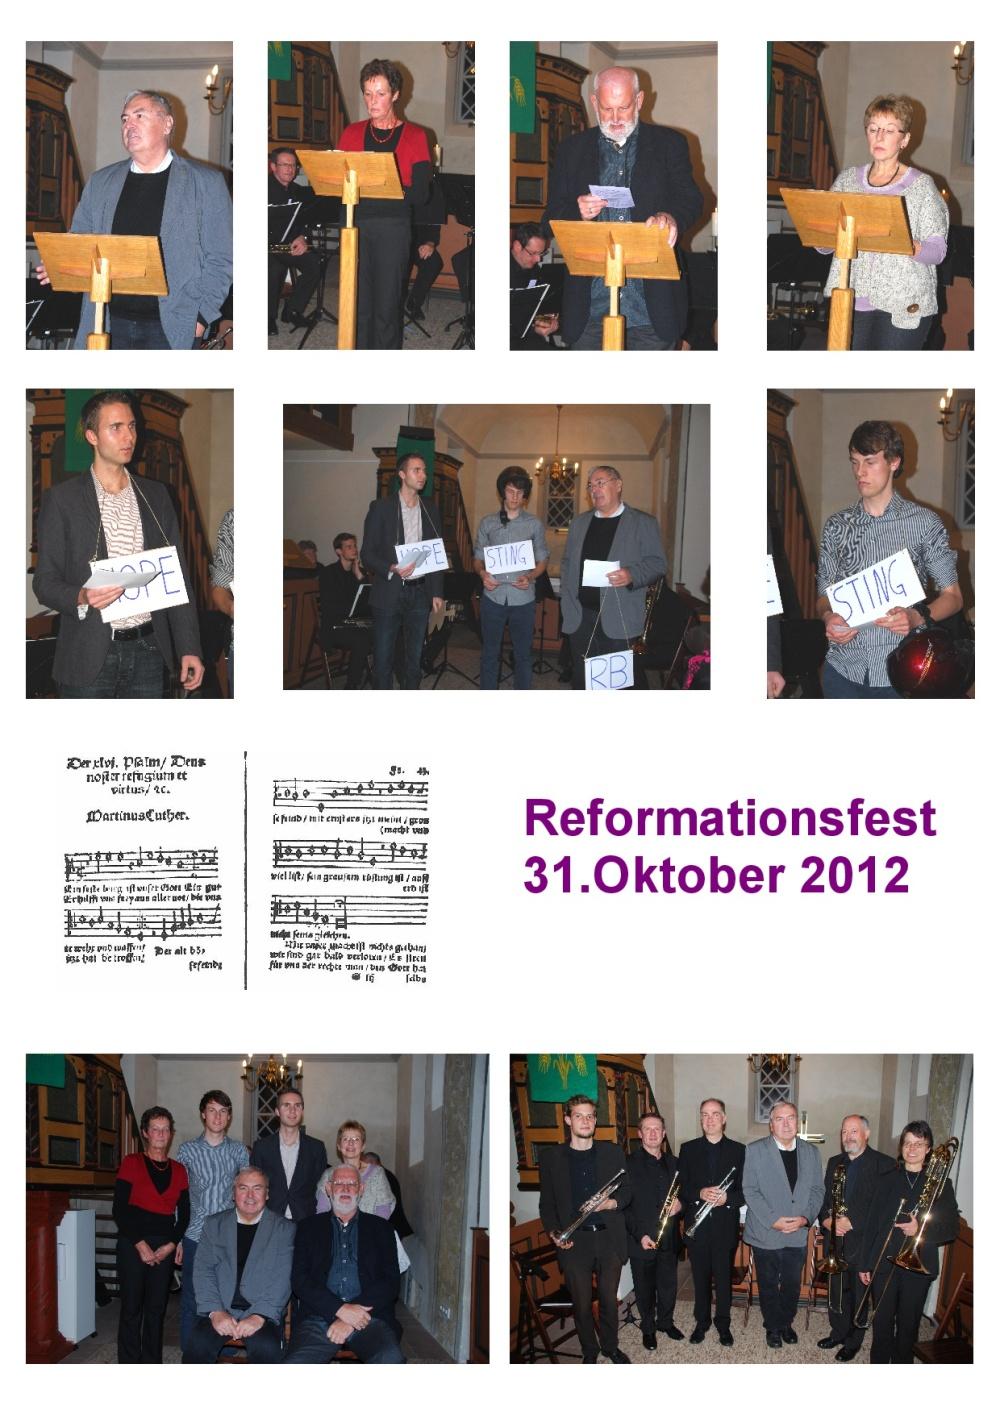 32-Reformationsfest-1 31.10.12-001